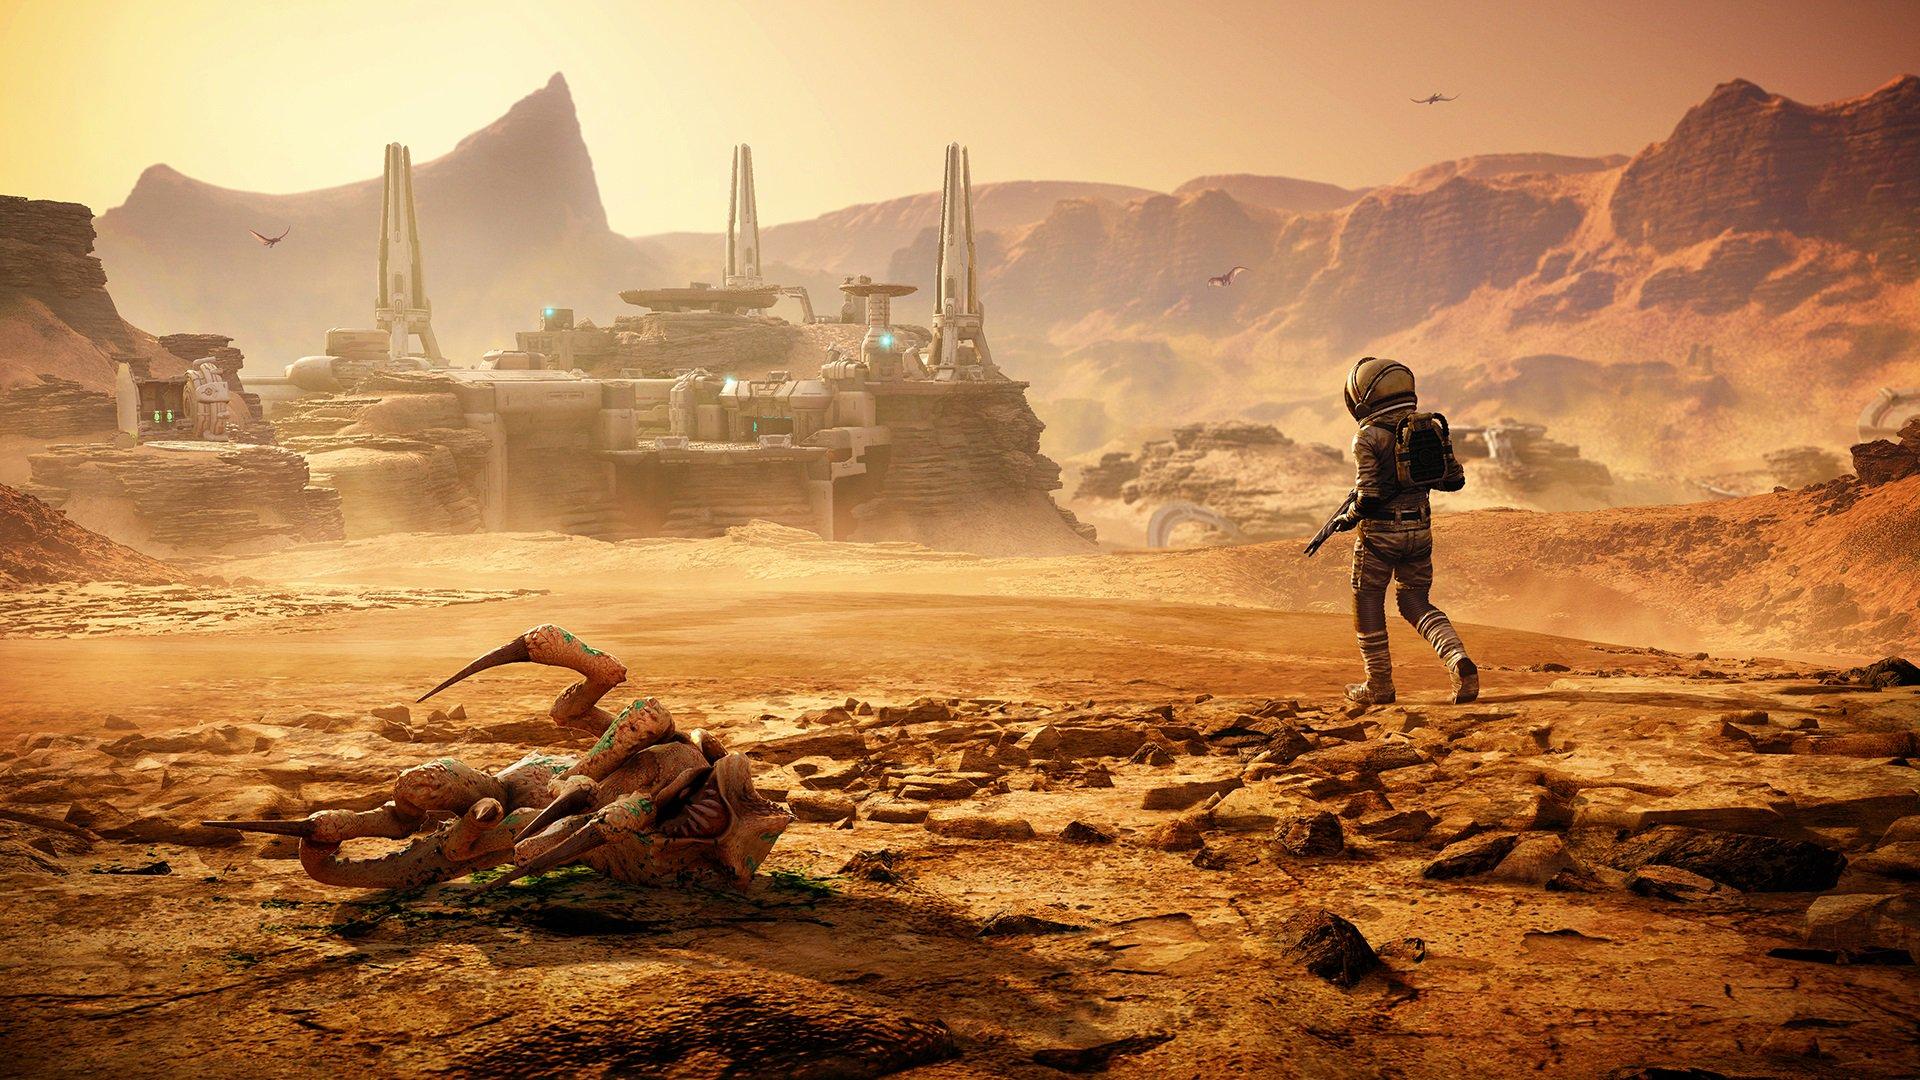 Far Cry 5: تاریخ انتشار بستهالحاقی Lost on Mars مشخص شد